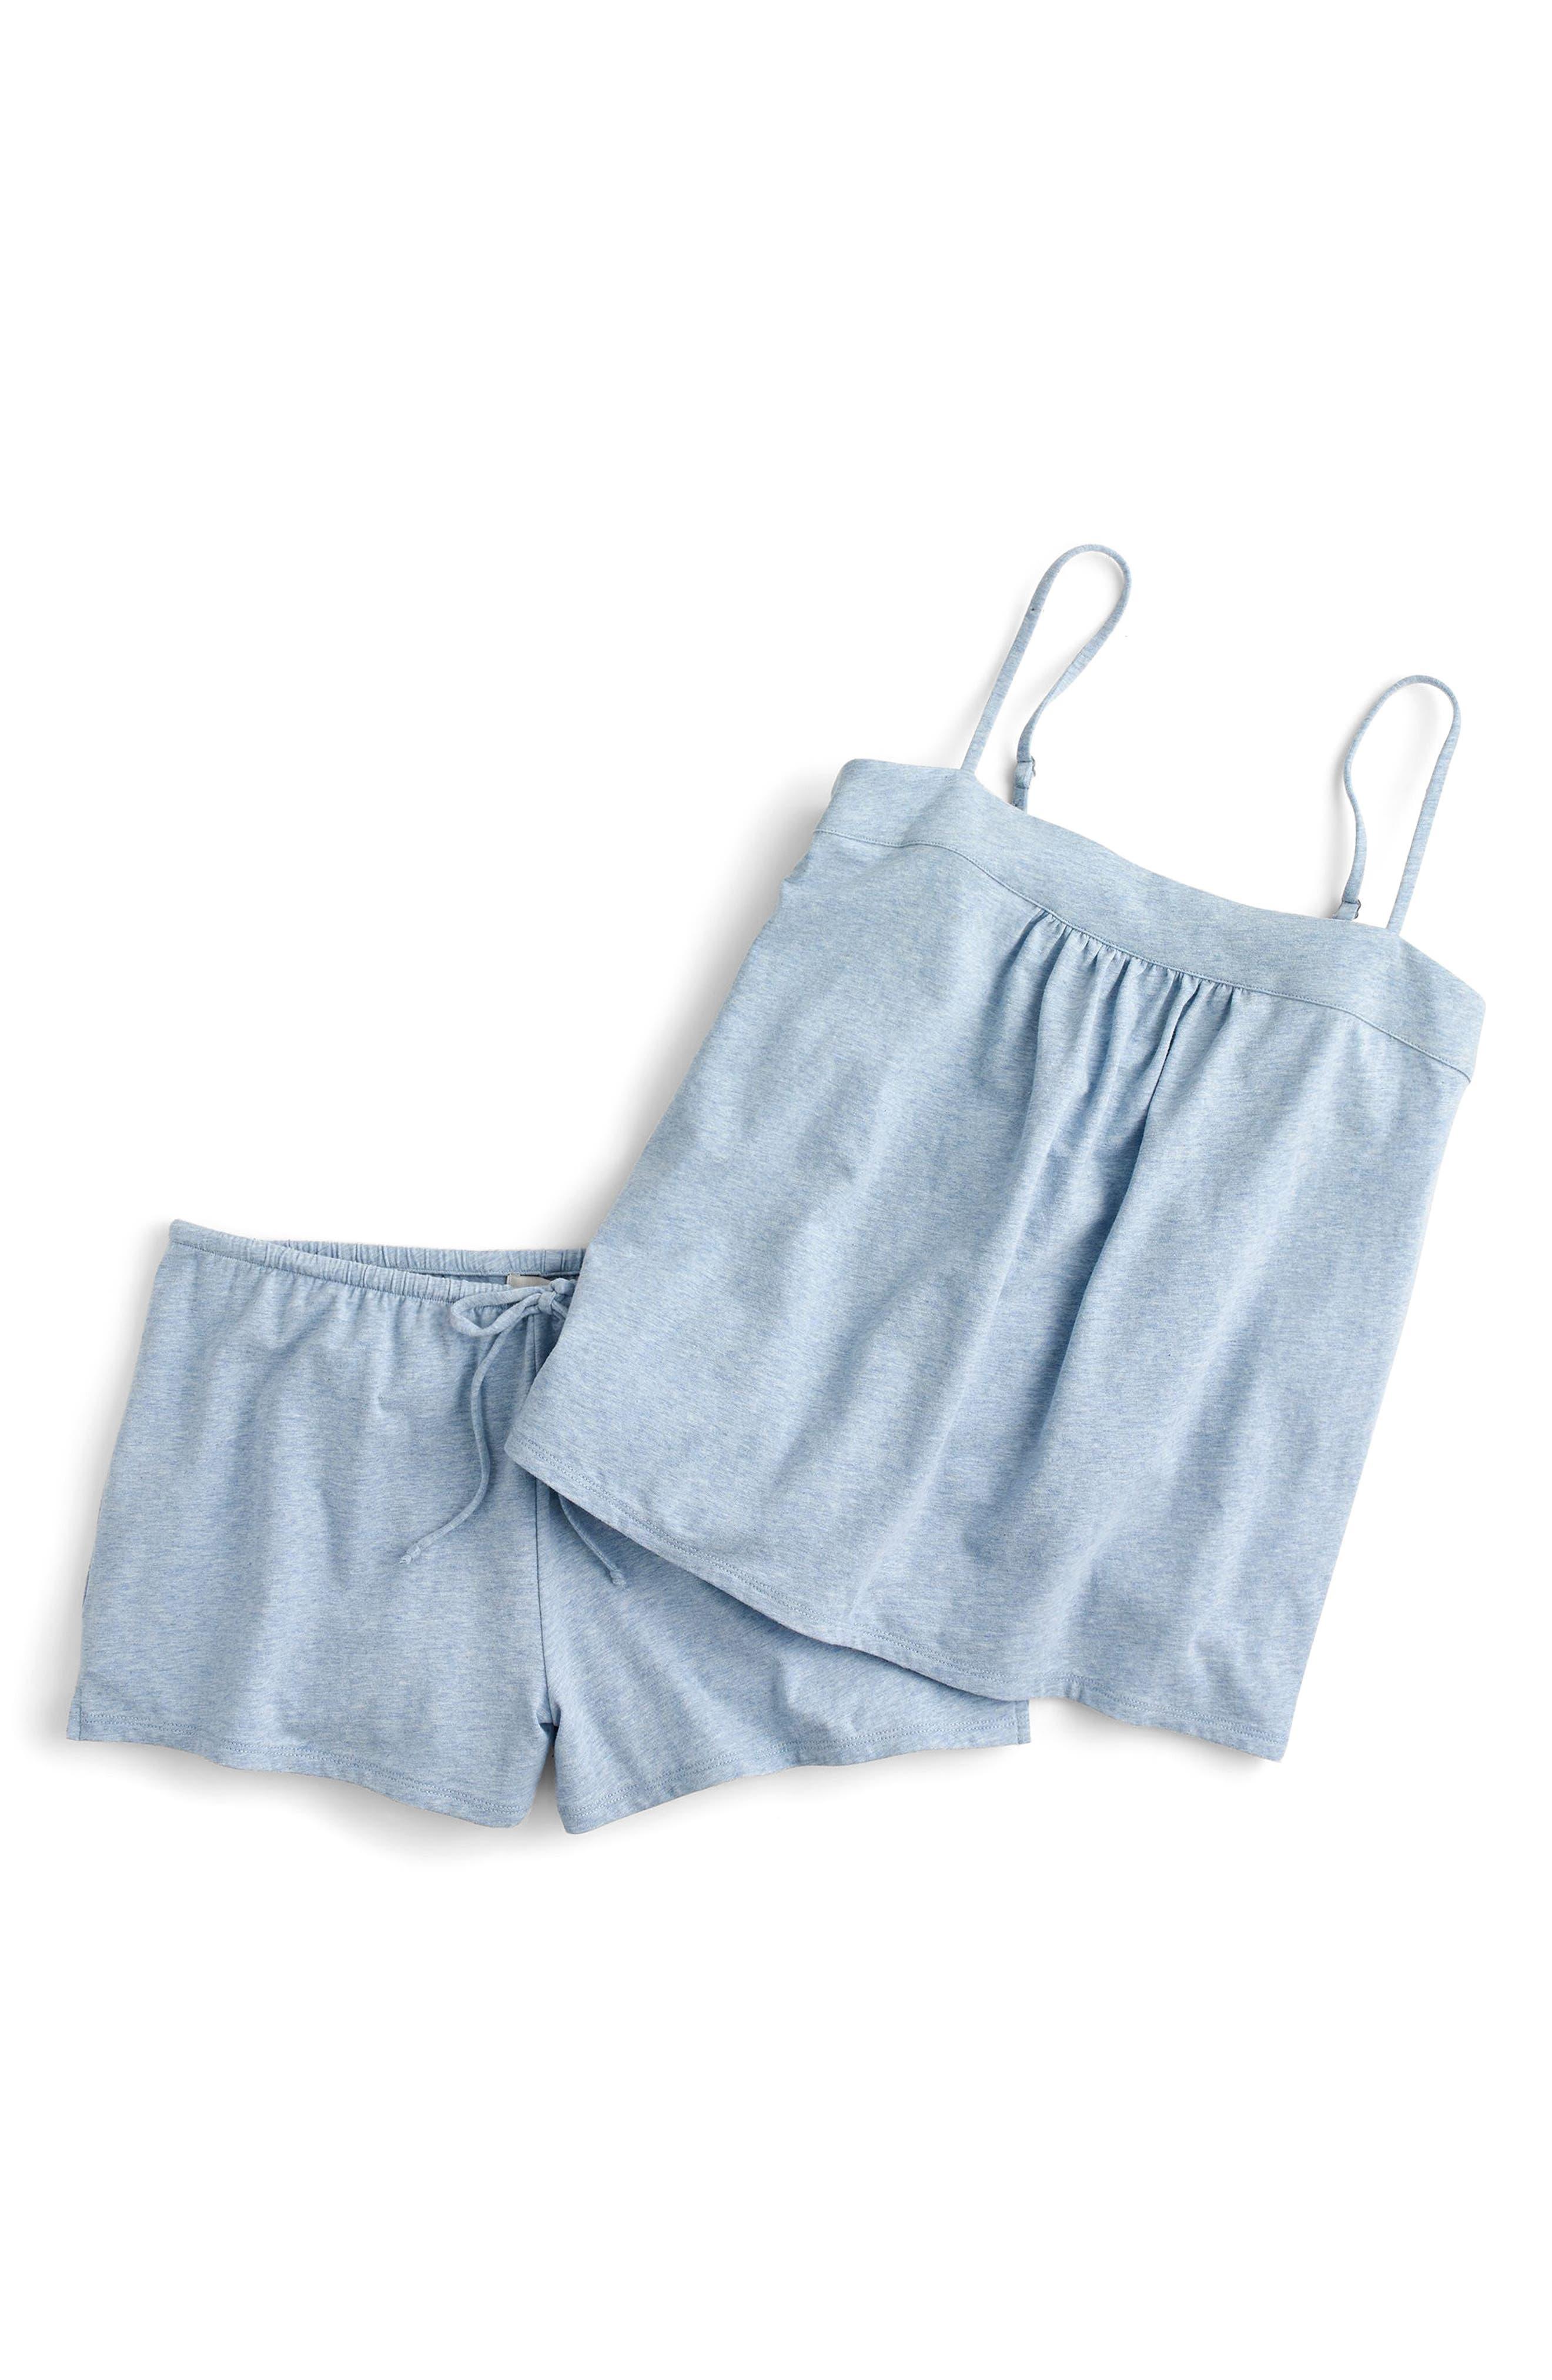 J.Crew Dreamy Pajama Shorts Set